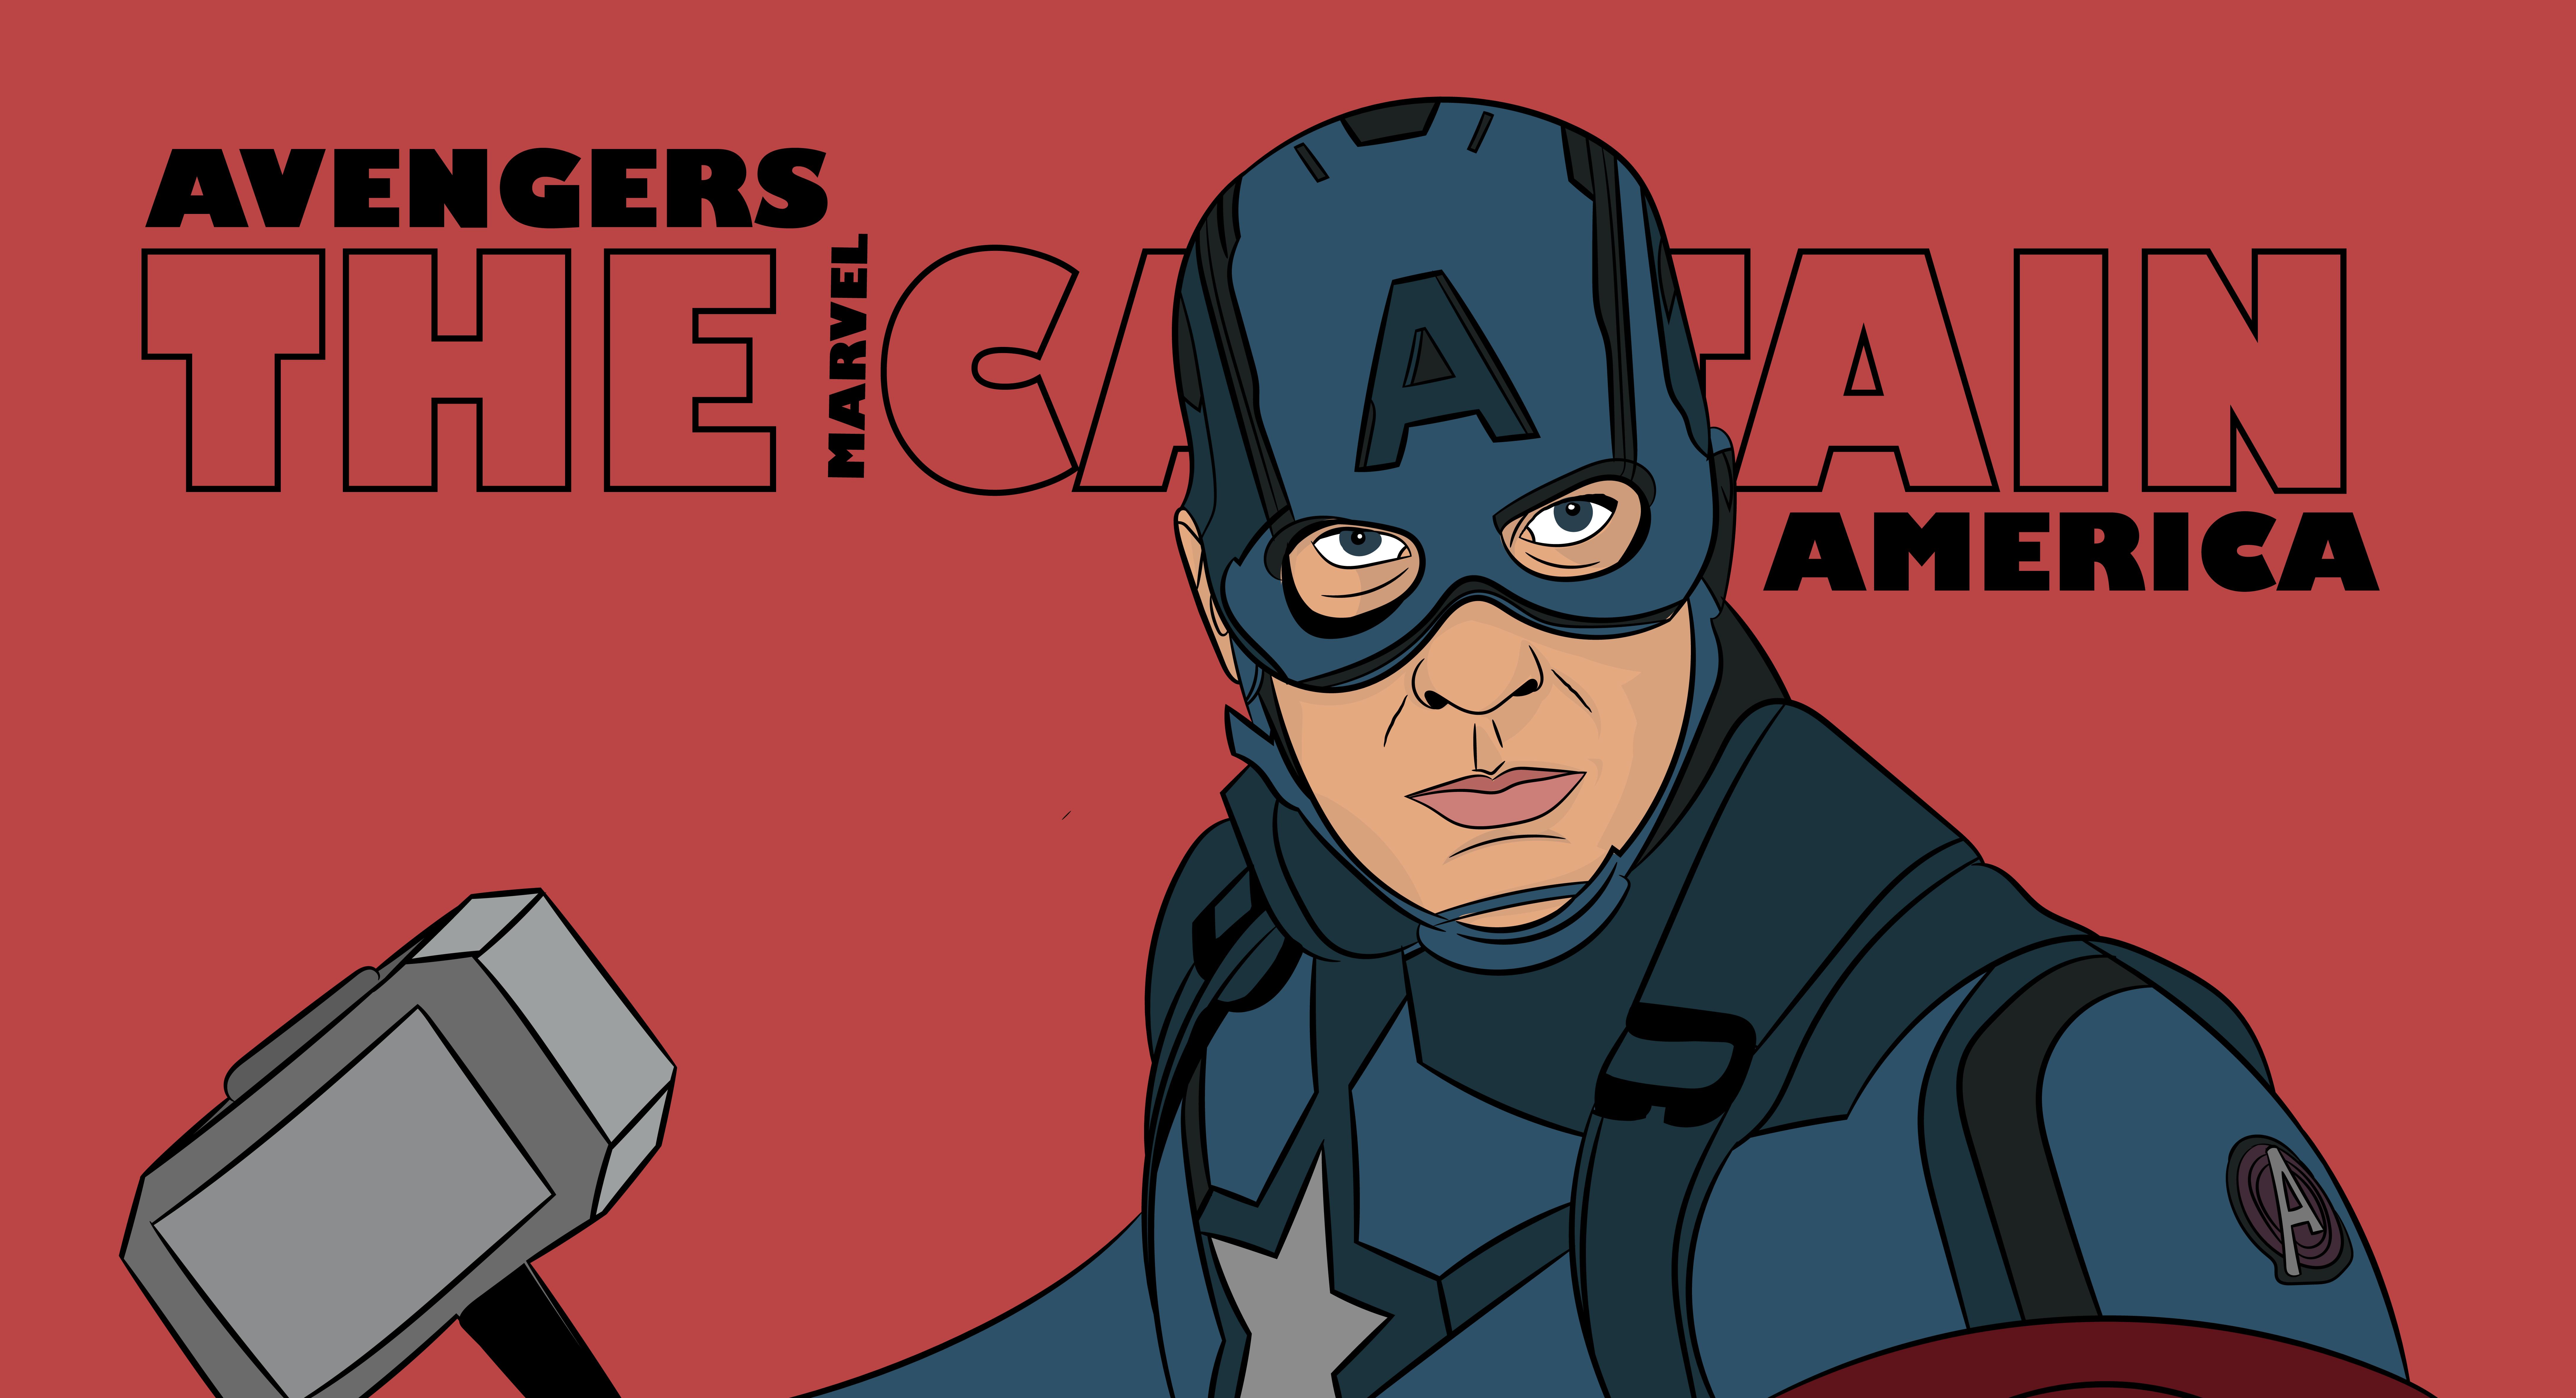 General 8716x4731 Captain America: The Winter Soldier Marvel Cinematic Universe superhero Avengers Endgame